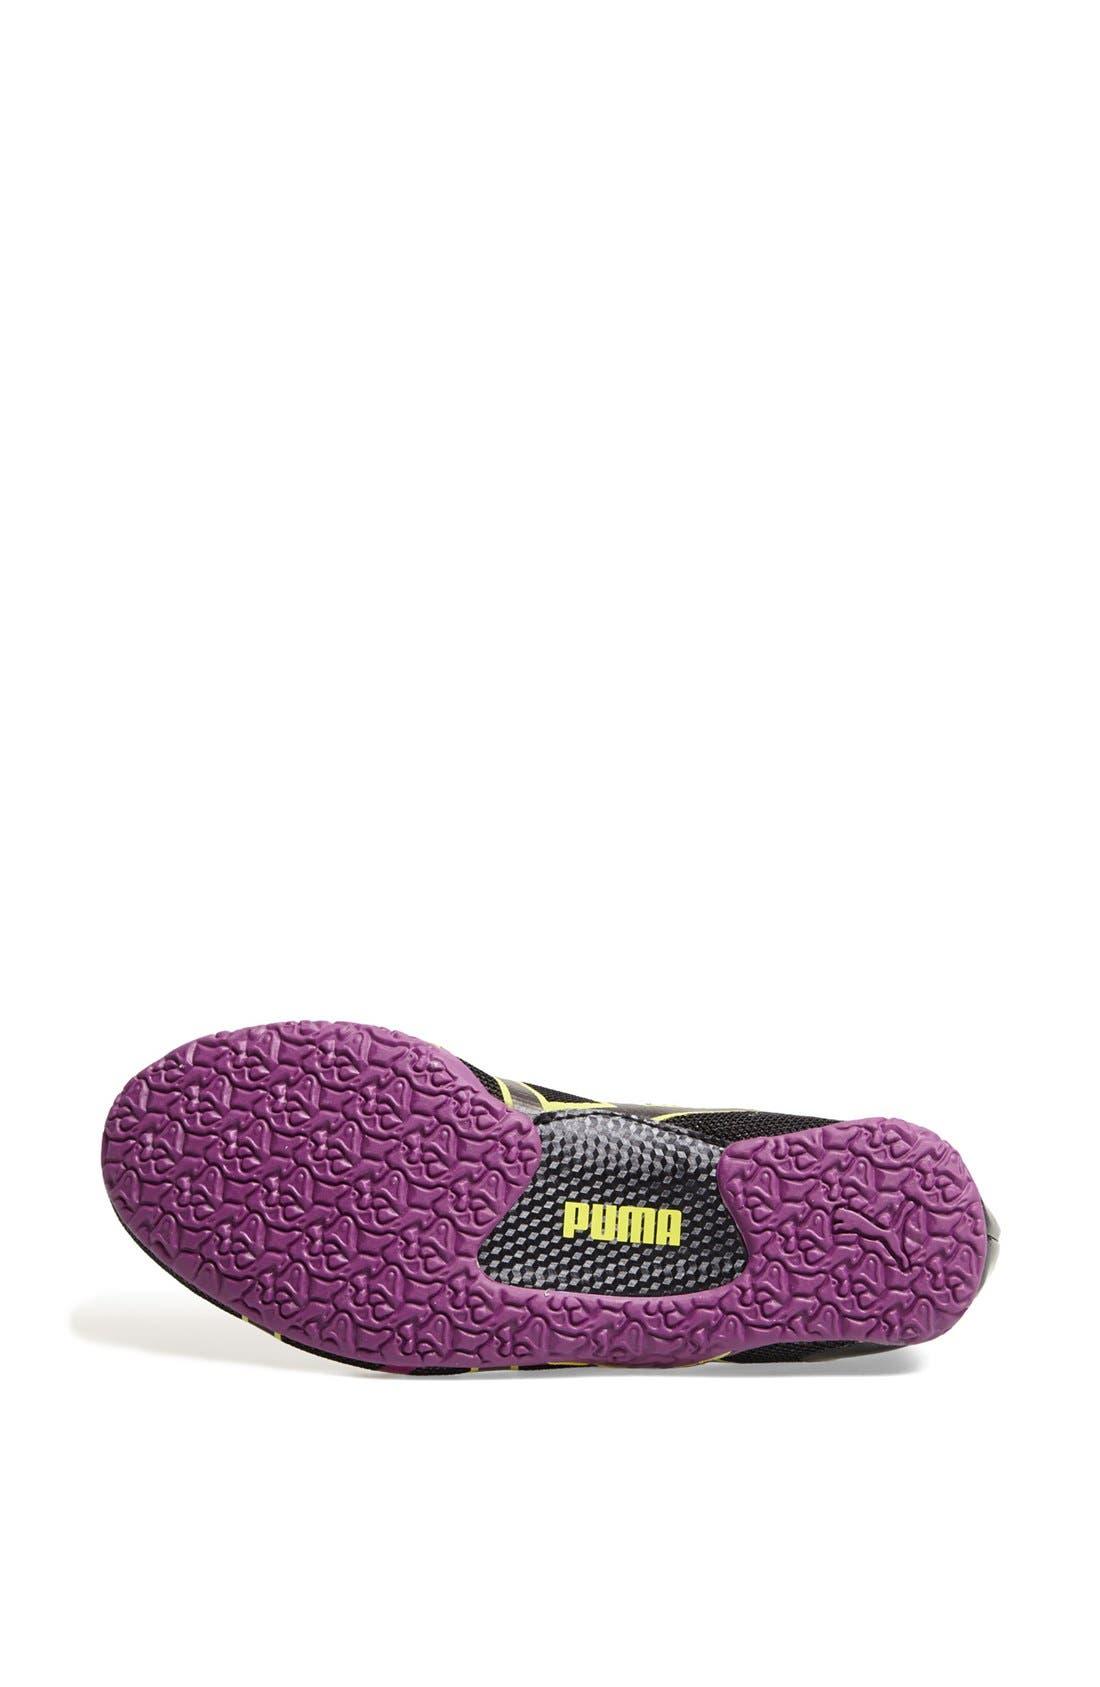 'Anaida' Foldable Sneaker,                             Alternate thumbnail 4, color,                             001